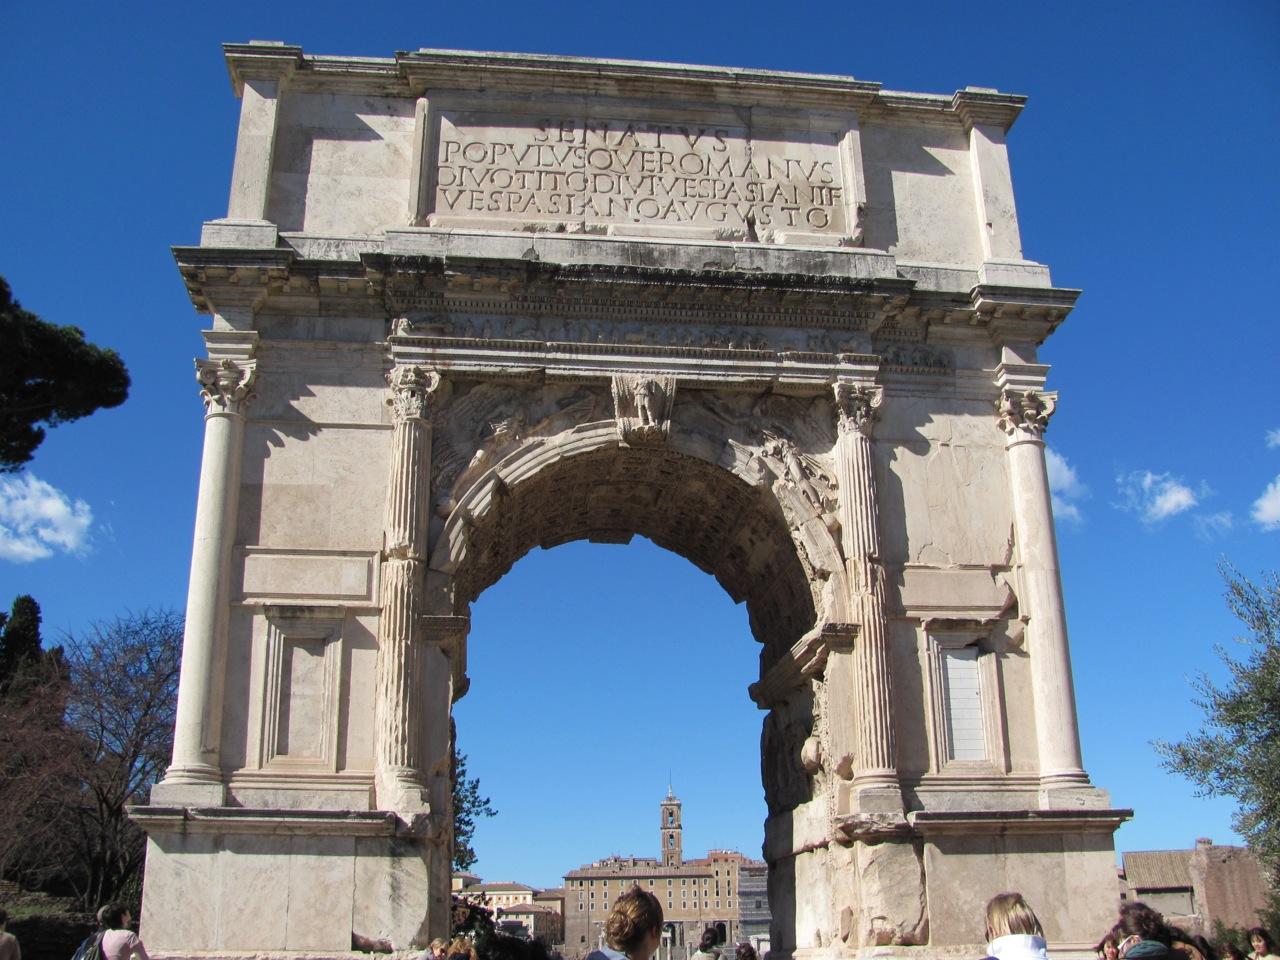 Who governs Roma Nova?